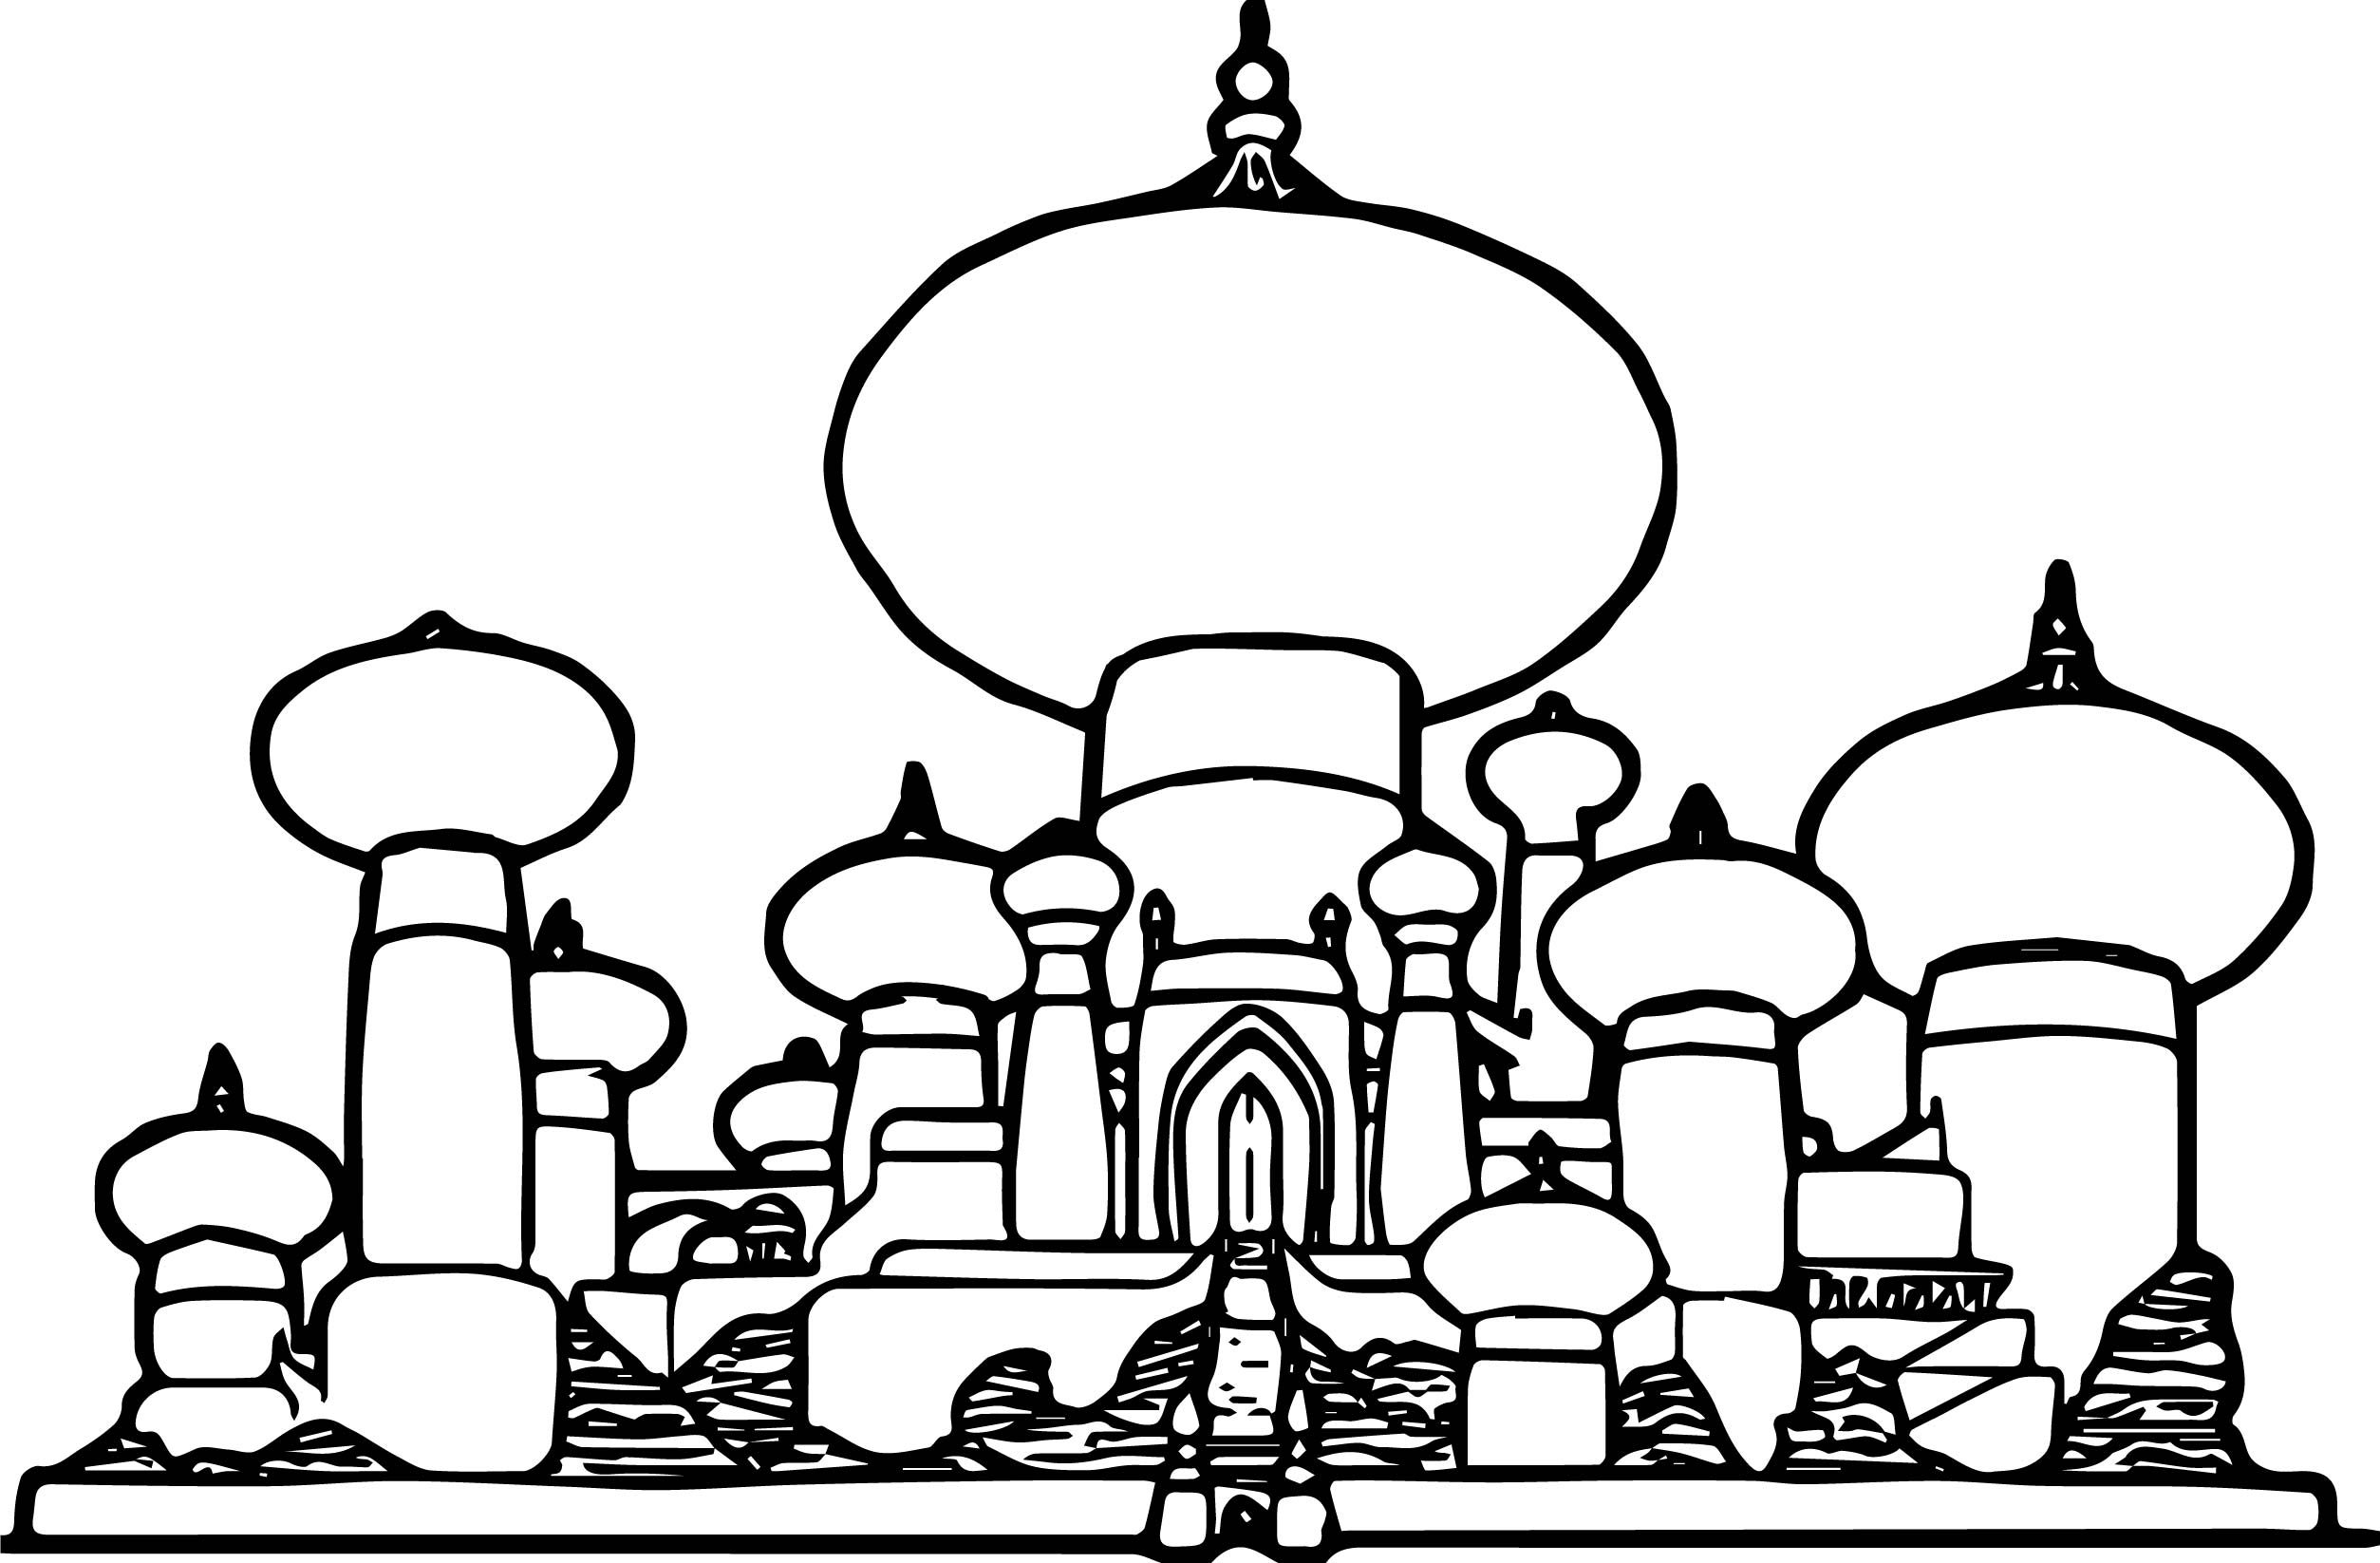 Disney Graphics Aladdin Castle Coloring Page Wecoloringpage